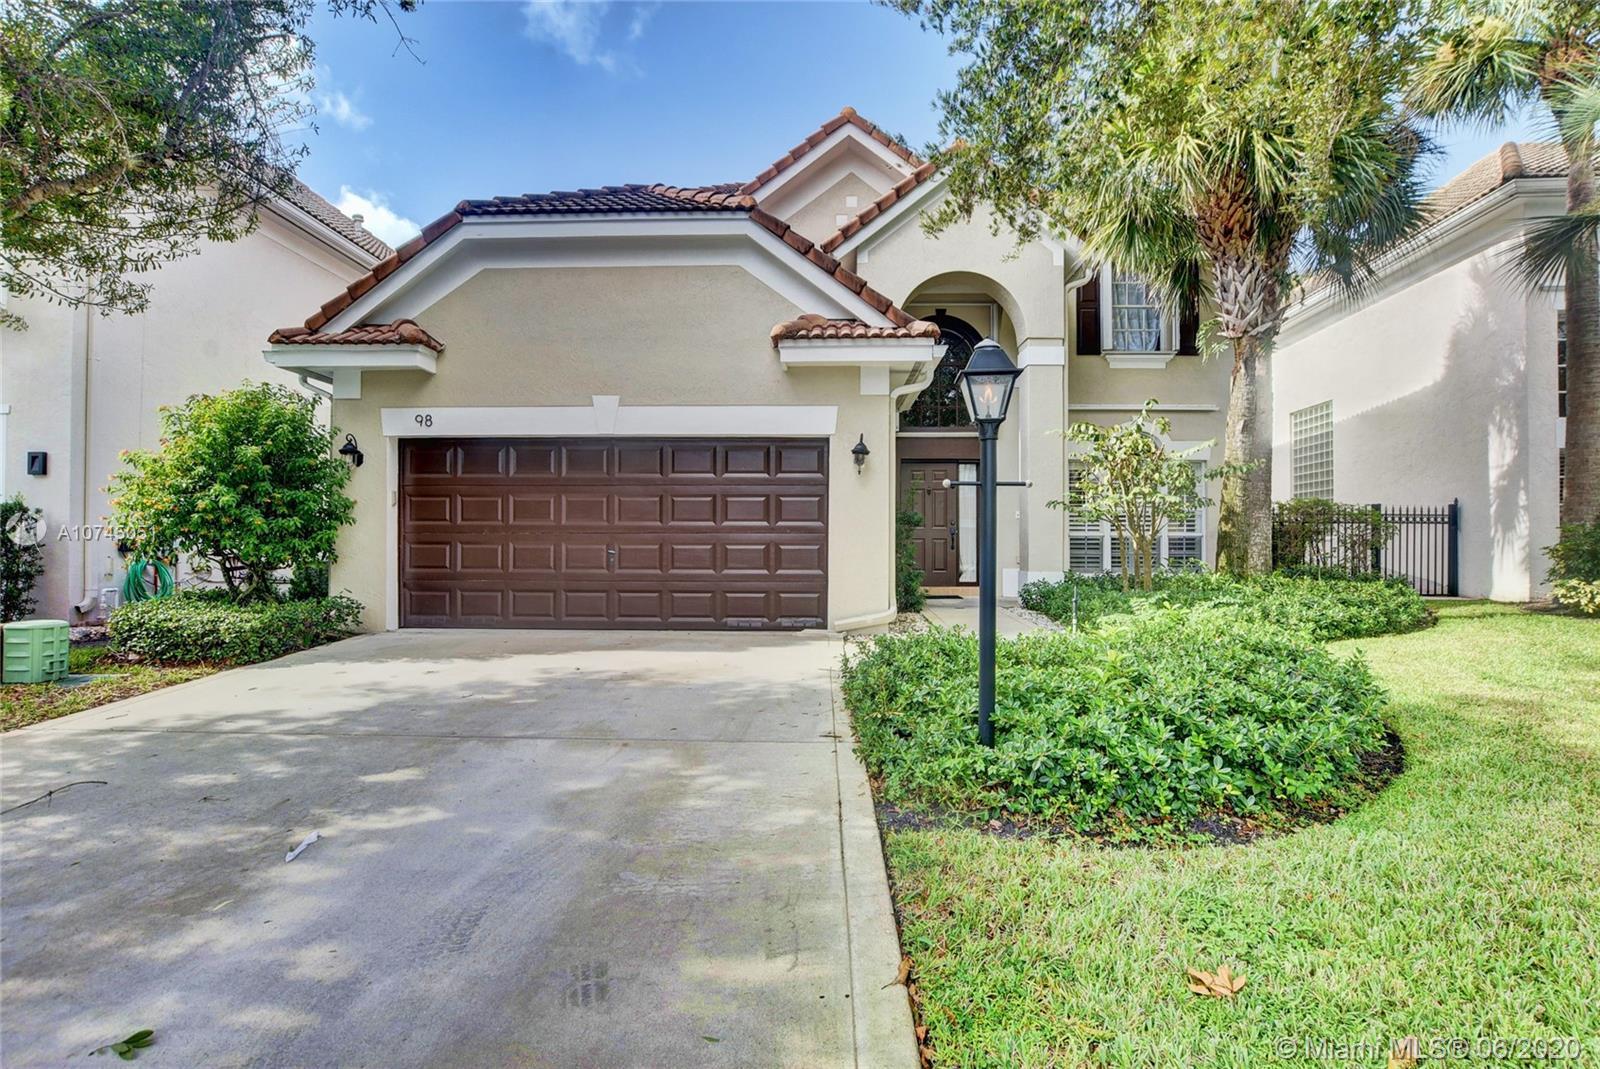 98 Satinwood Ln, Palm Beach Gardens, FL 33410